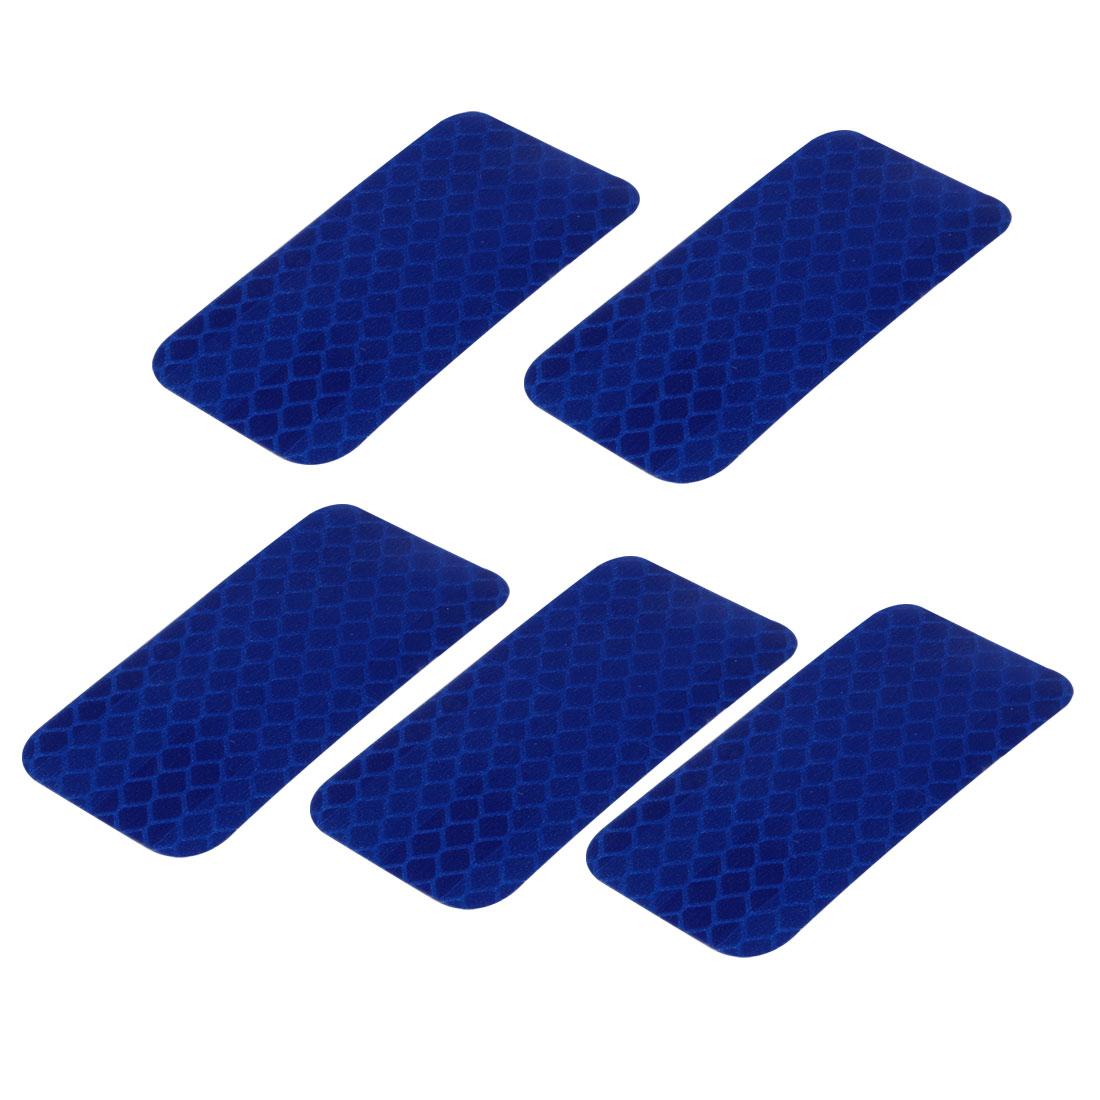 5pcs Honeycomb Reflective Warning Tape Film Sticker Blue 30mm x 60mm